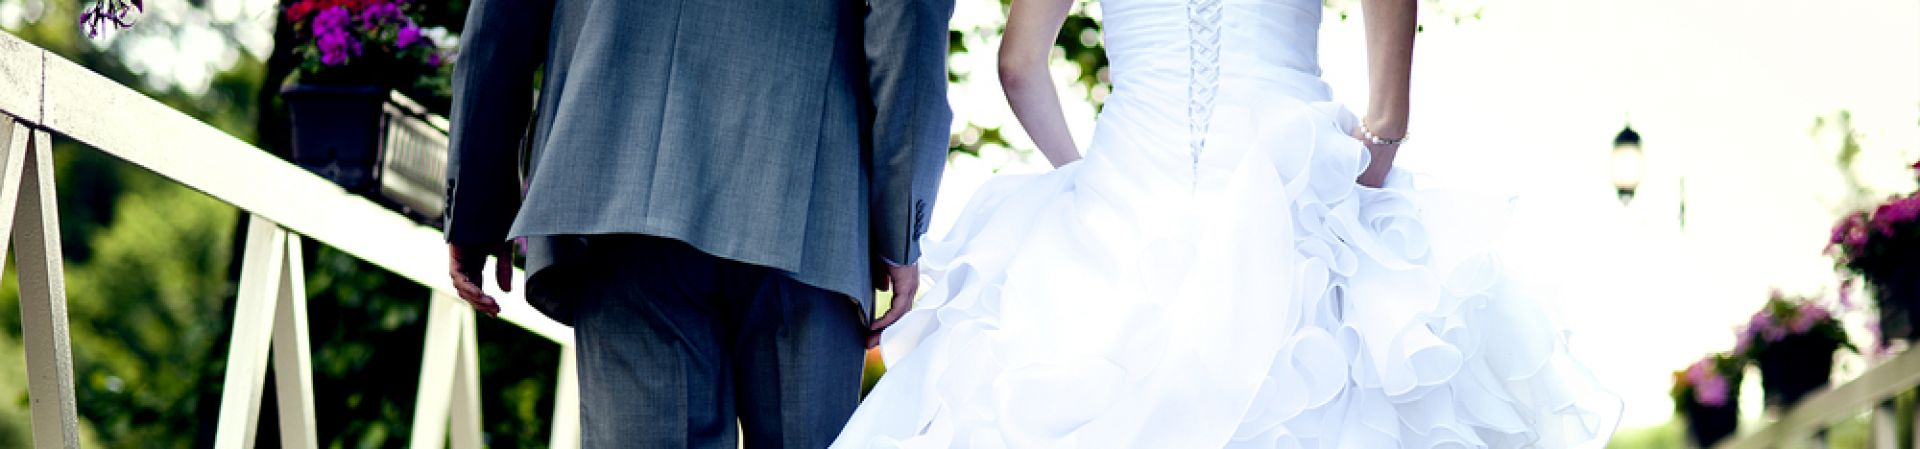 Bruiloft bij Stadscafé Blij